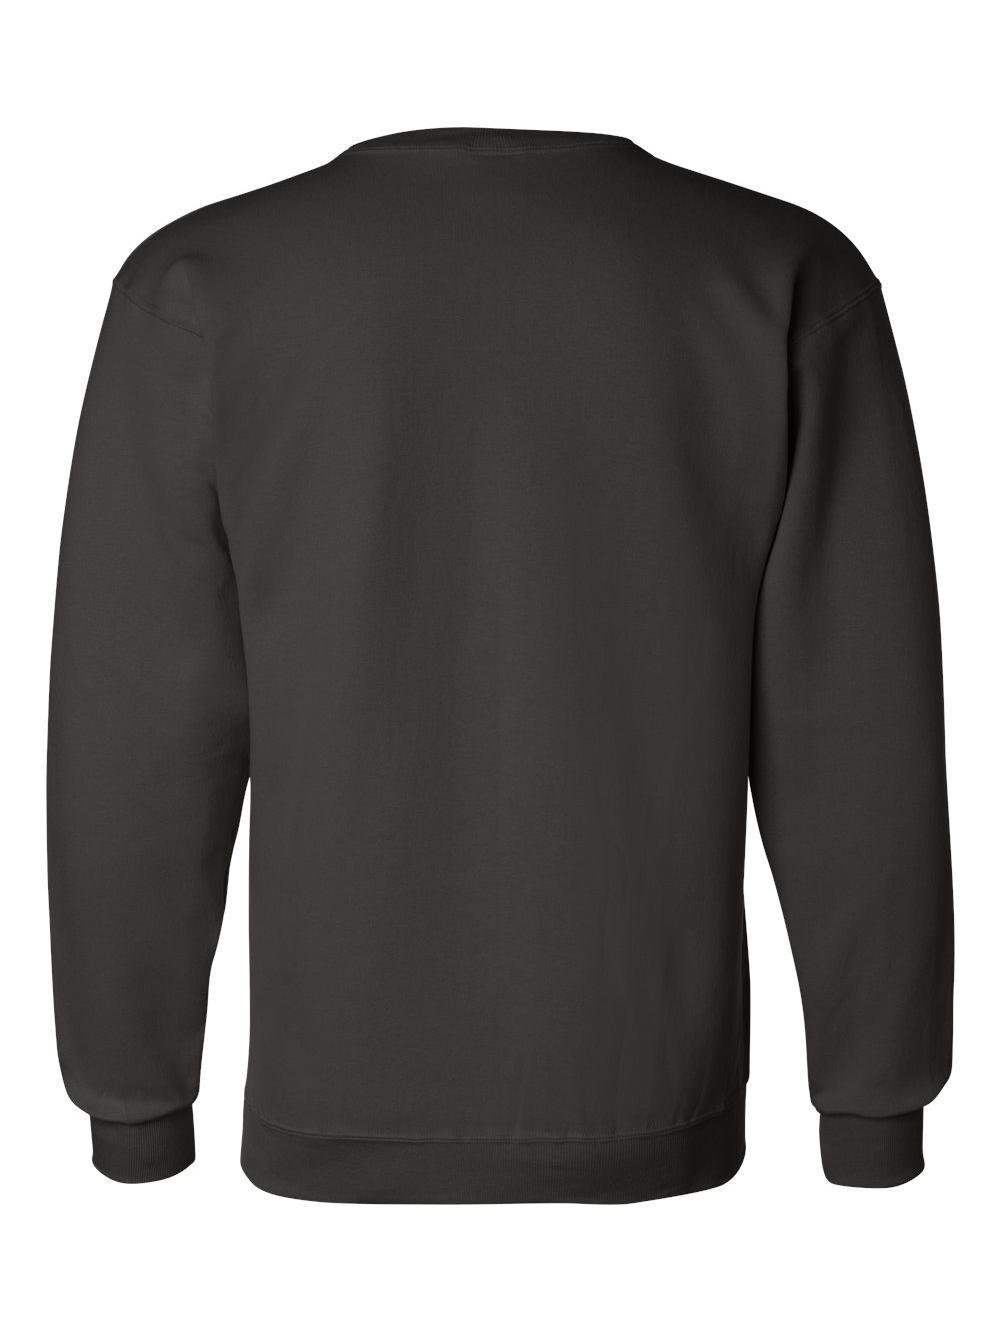 Champion-Double-Dry-Eco-Crewneck-Sweatshirt-S600 thumbnail 4